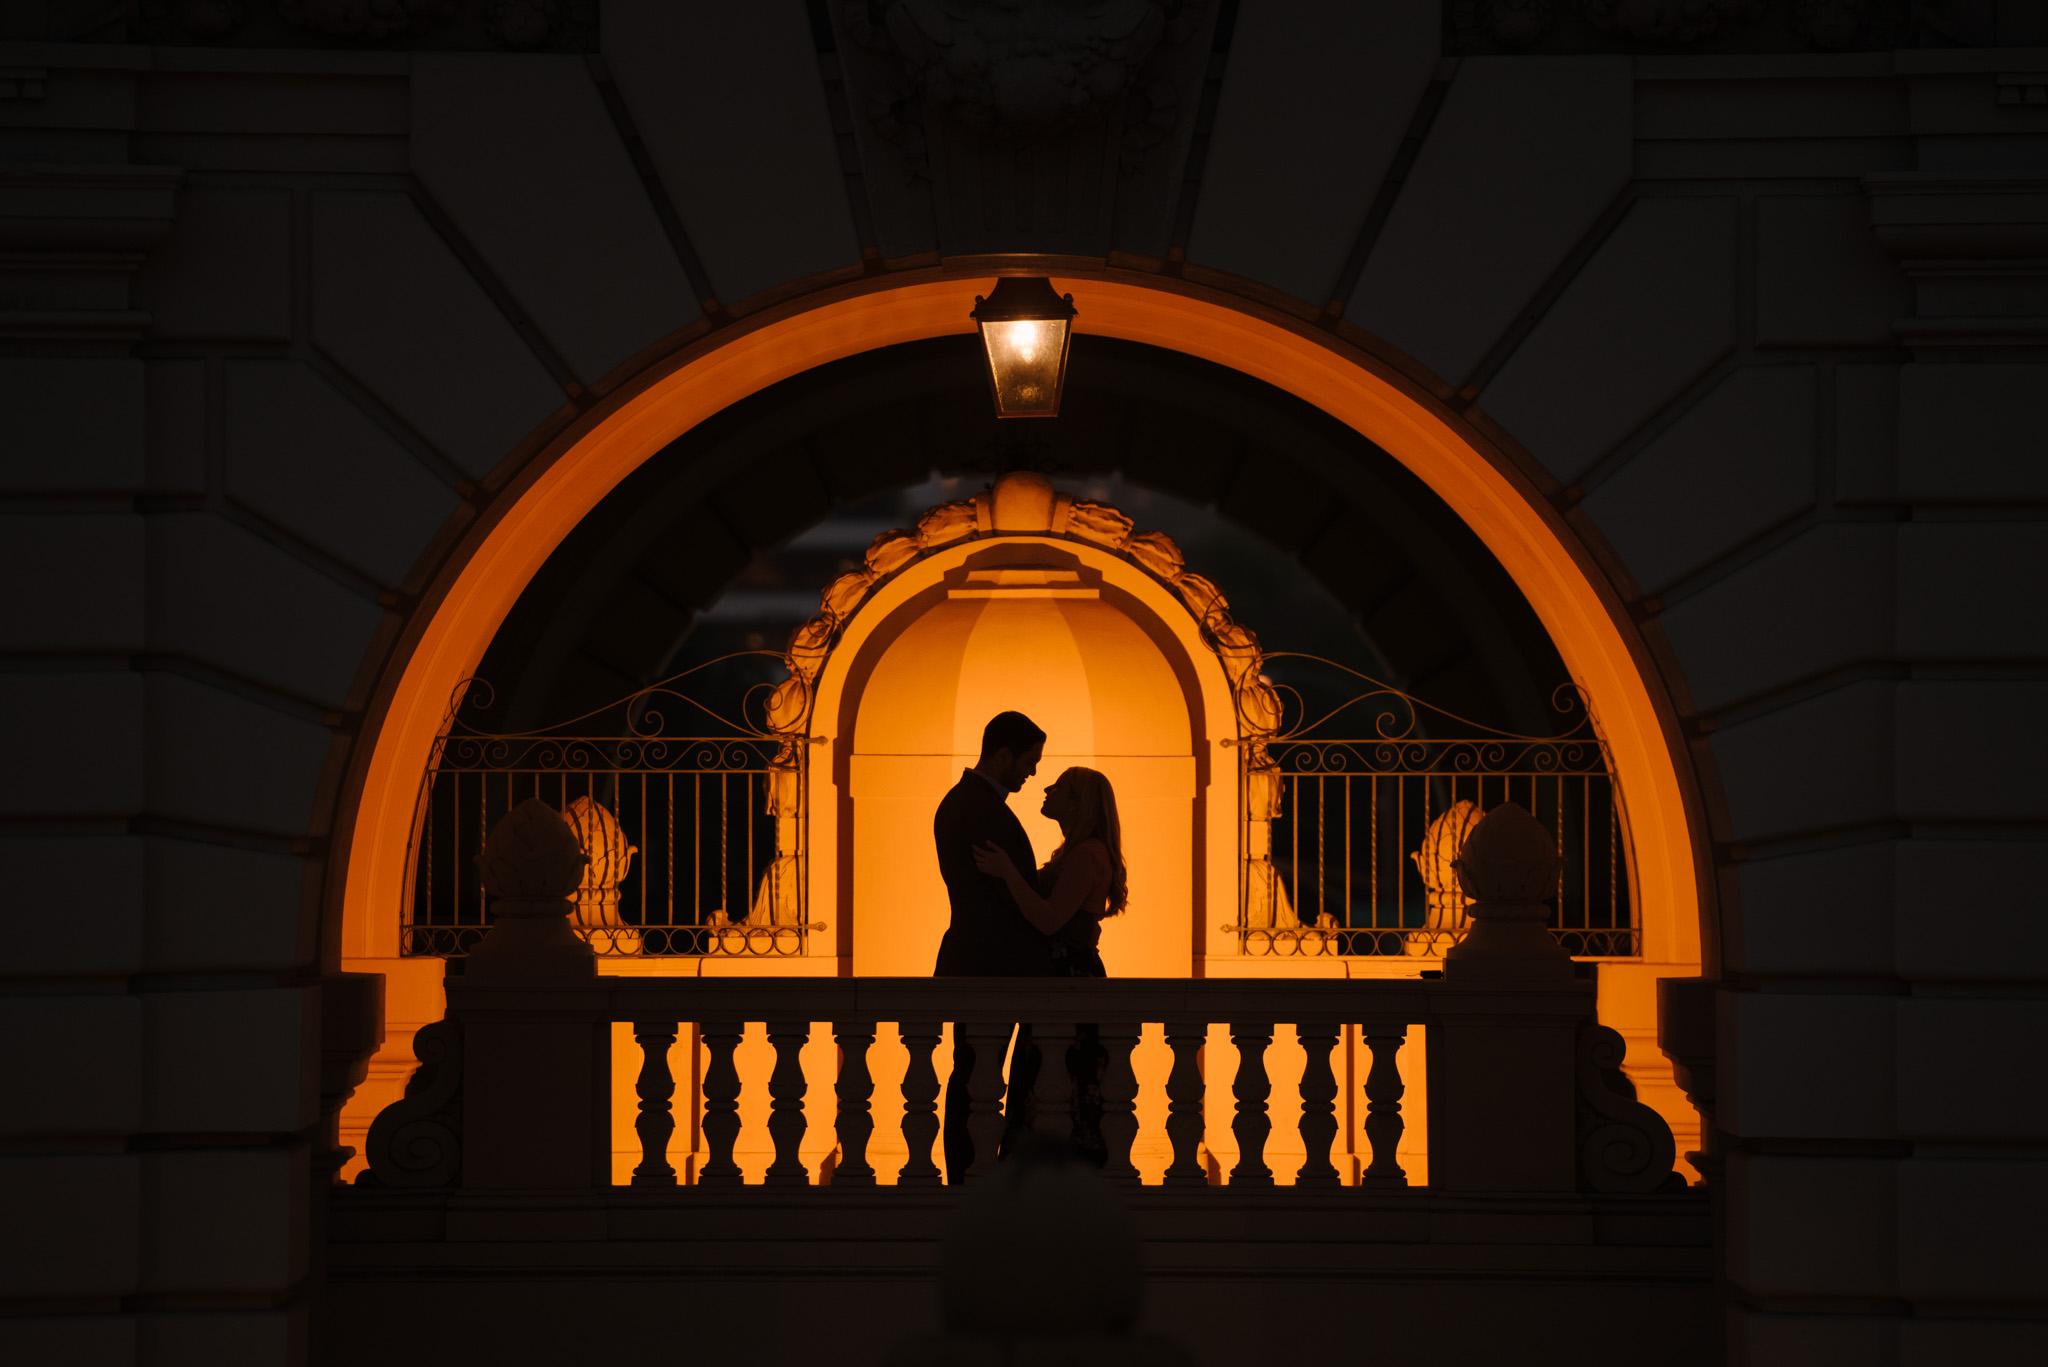 0016-JM-Pasadena-City-Hall-Los-Angeles-County-Engagement-Photography